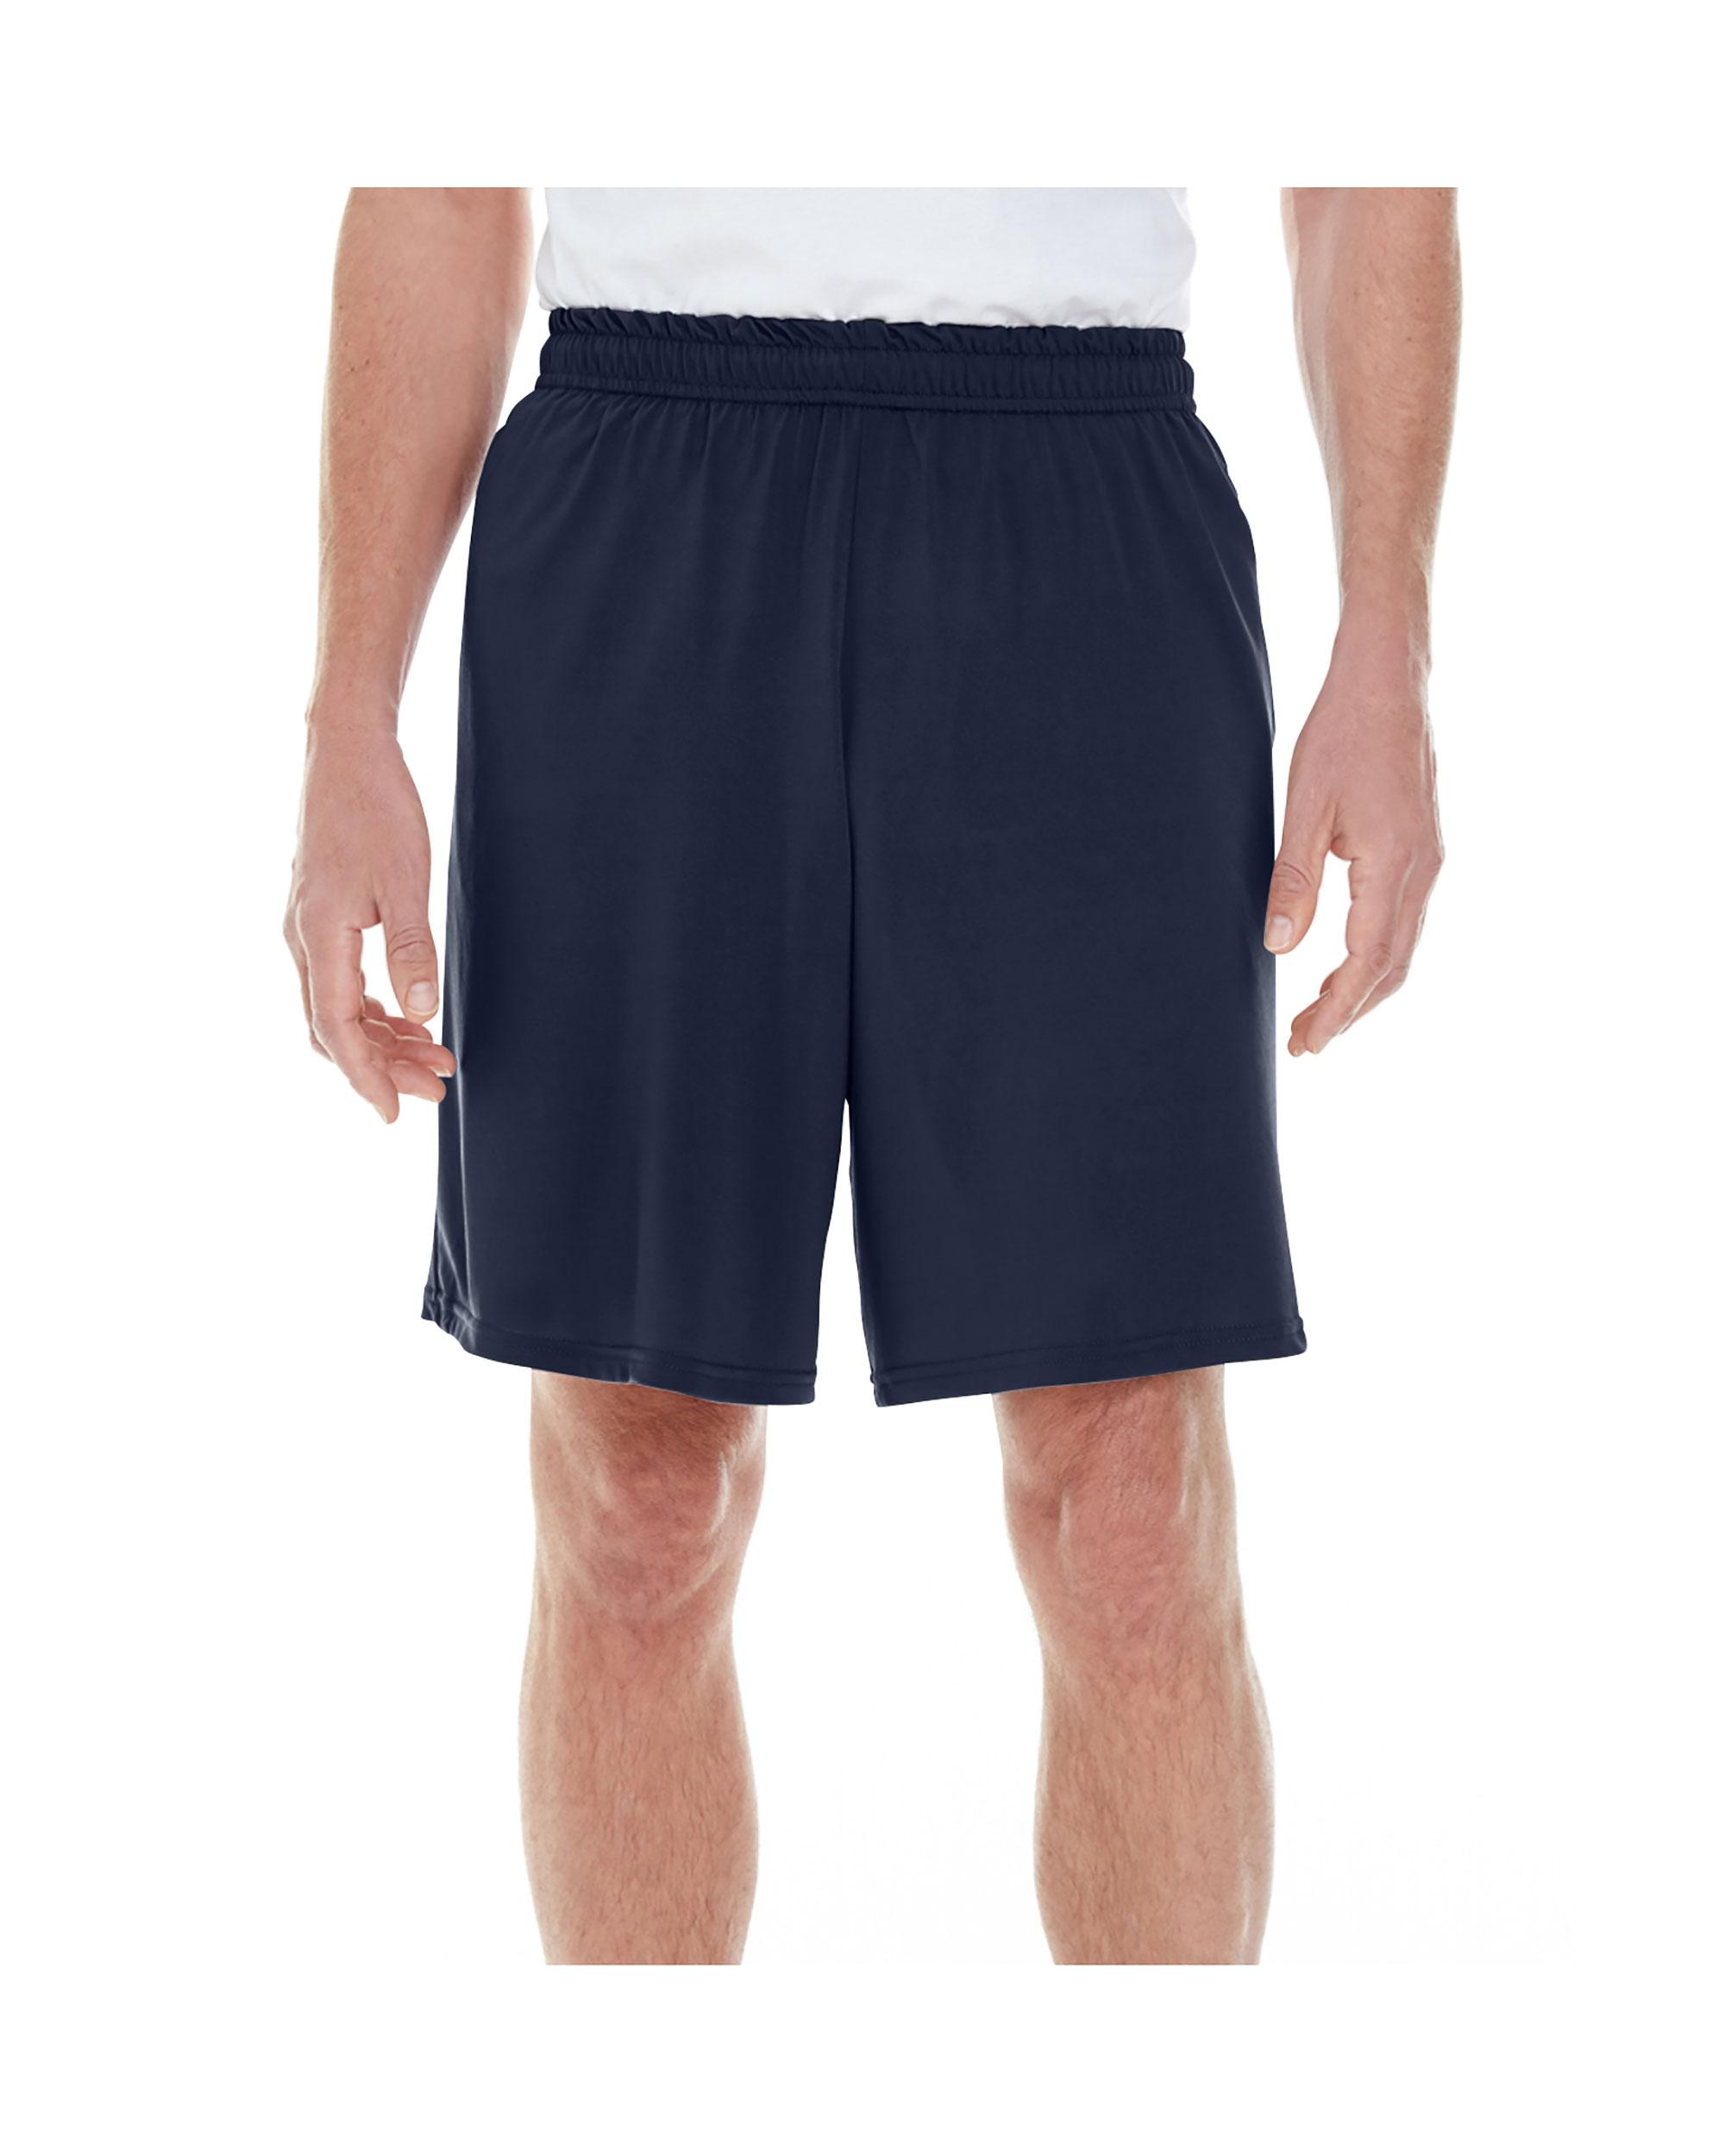 Gildan Men's Performance® 4.7 Oz. Core Shorts, Style G46S30